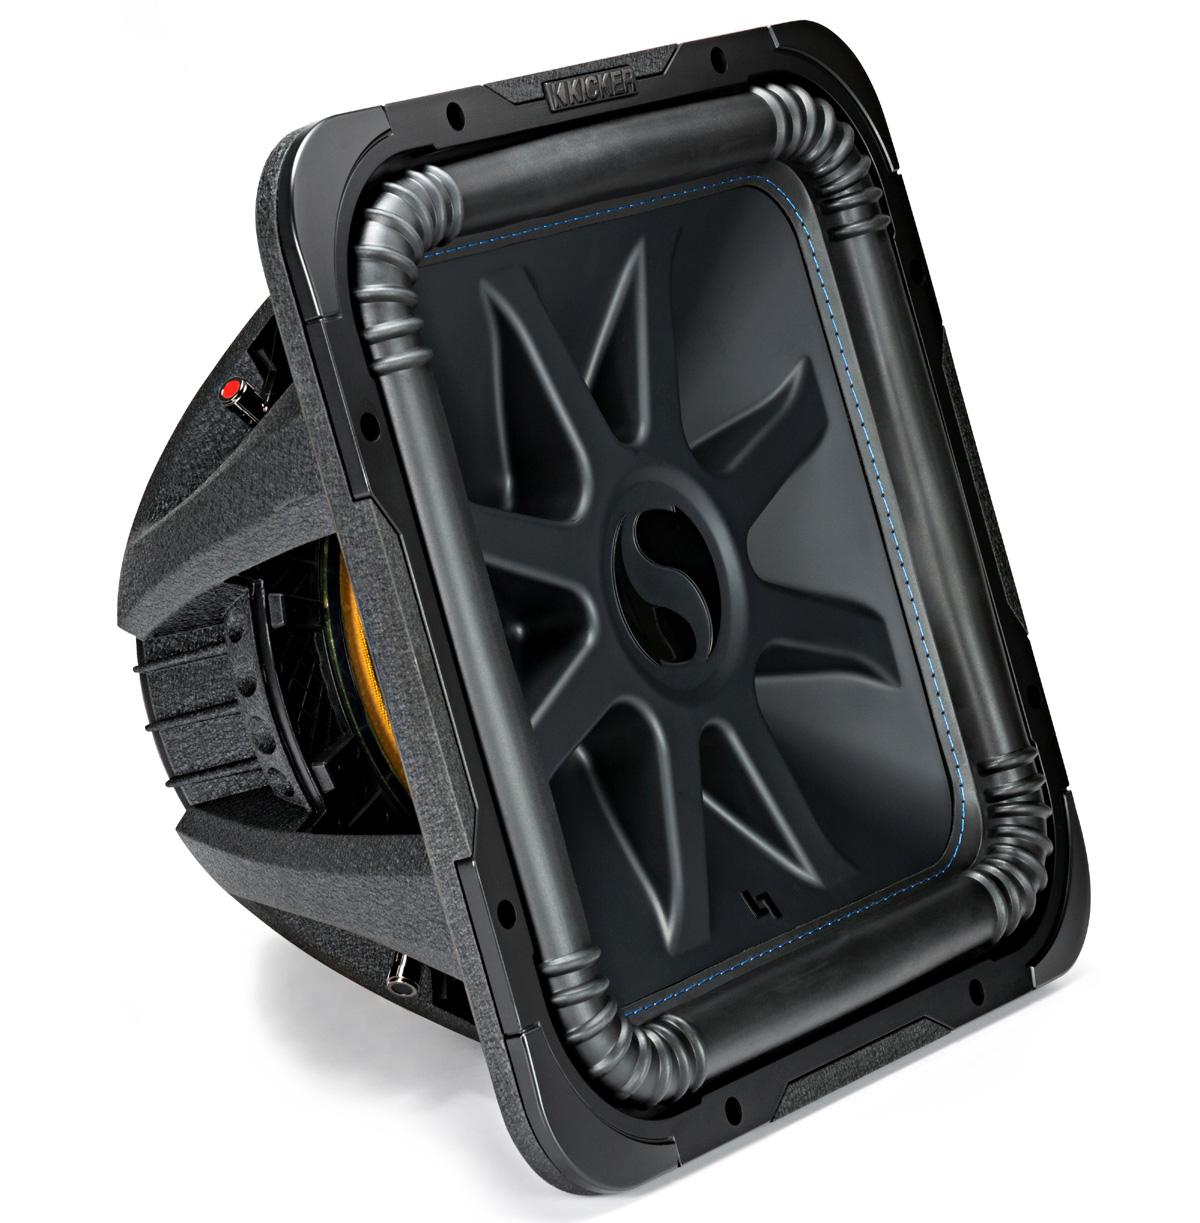 Kicker L7S15 (44L7S152) Car Audio Solo-Baric 15 Subwoofer Square L7 ...